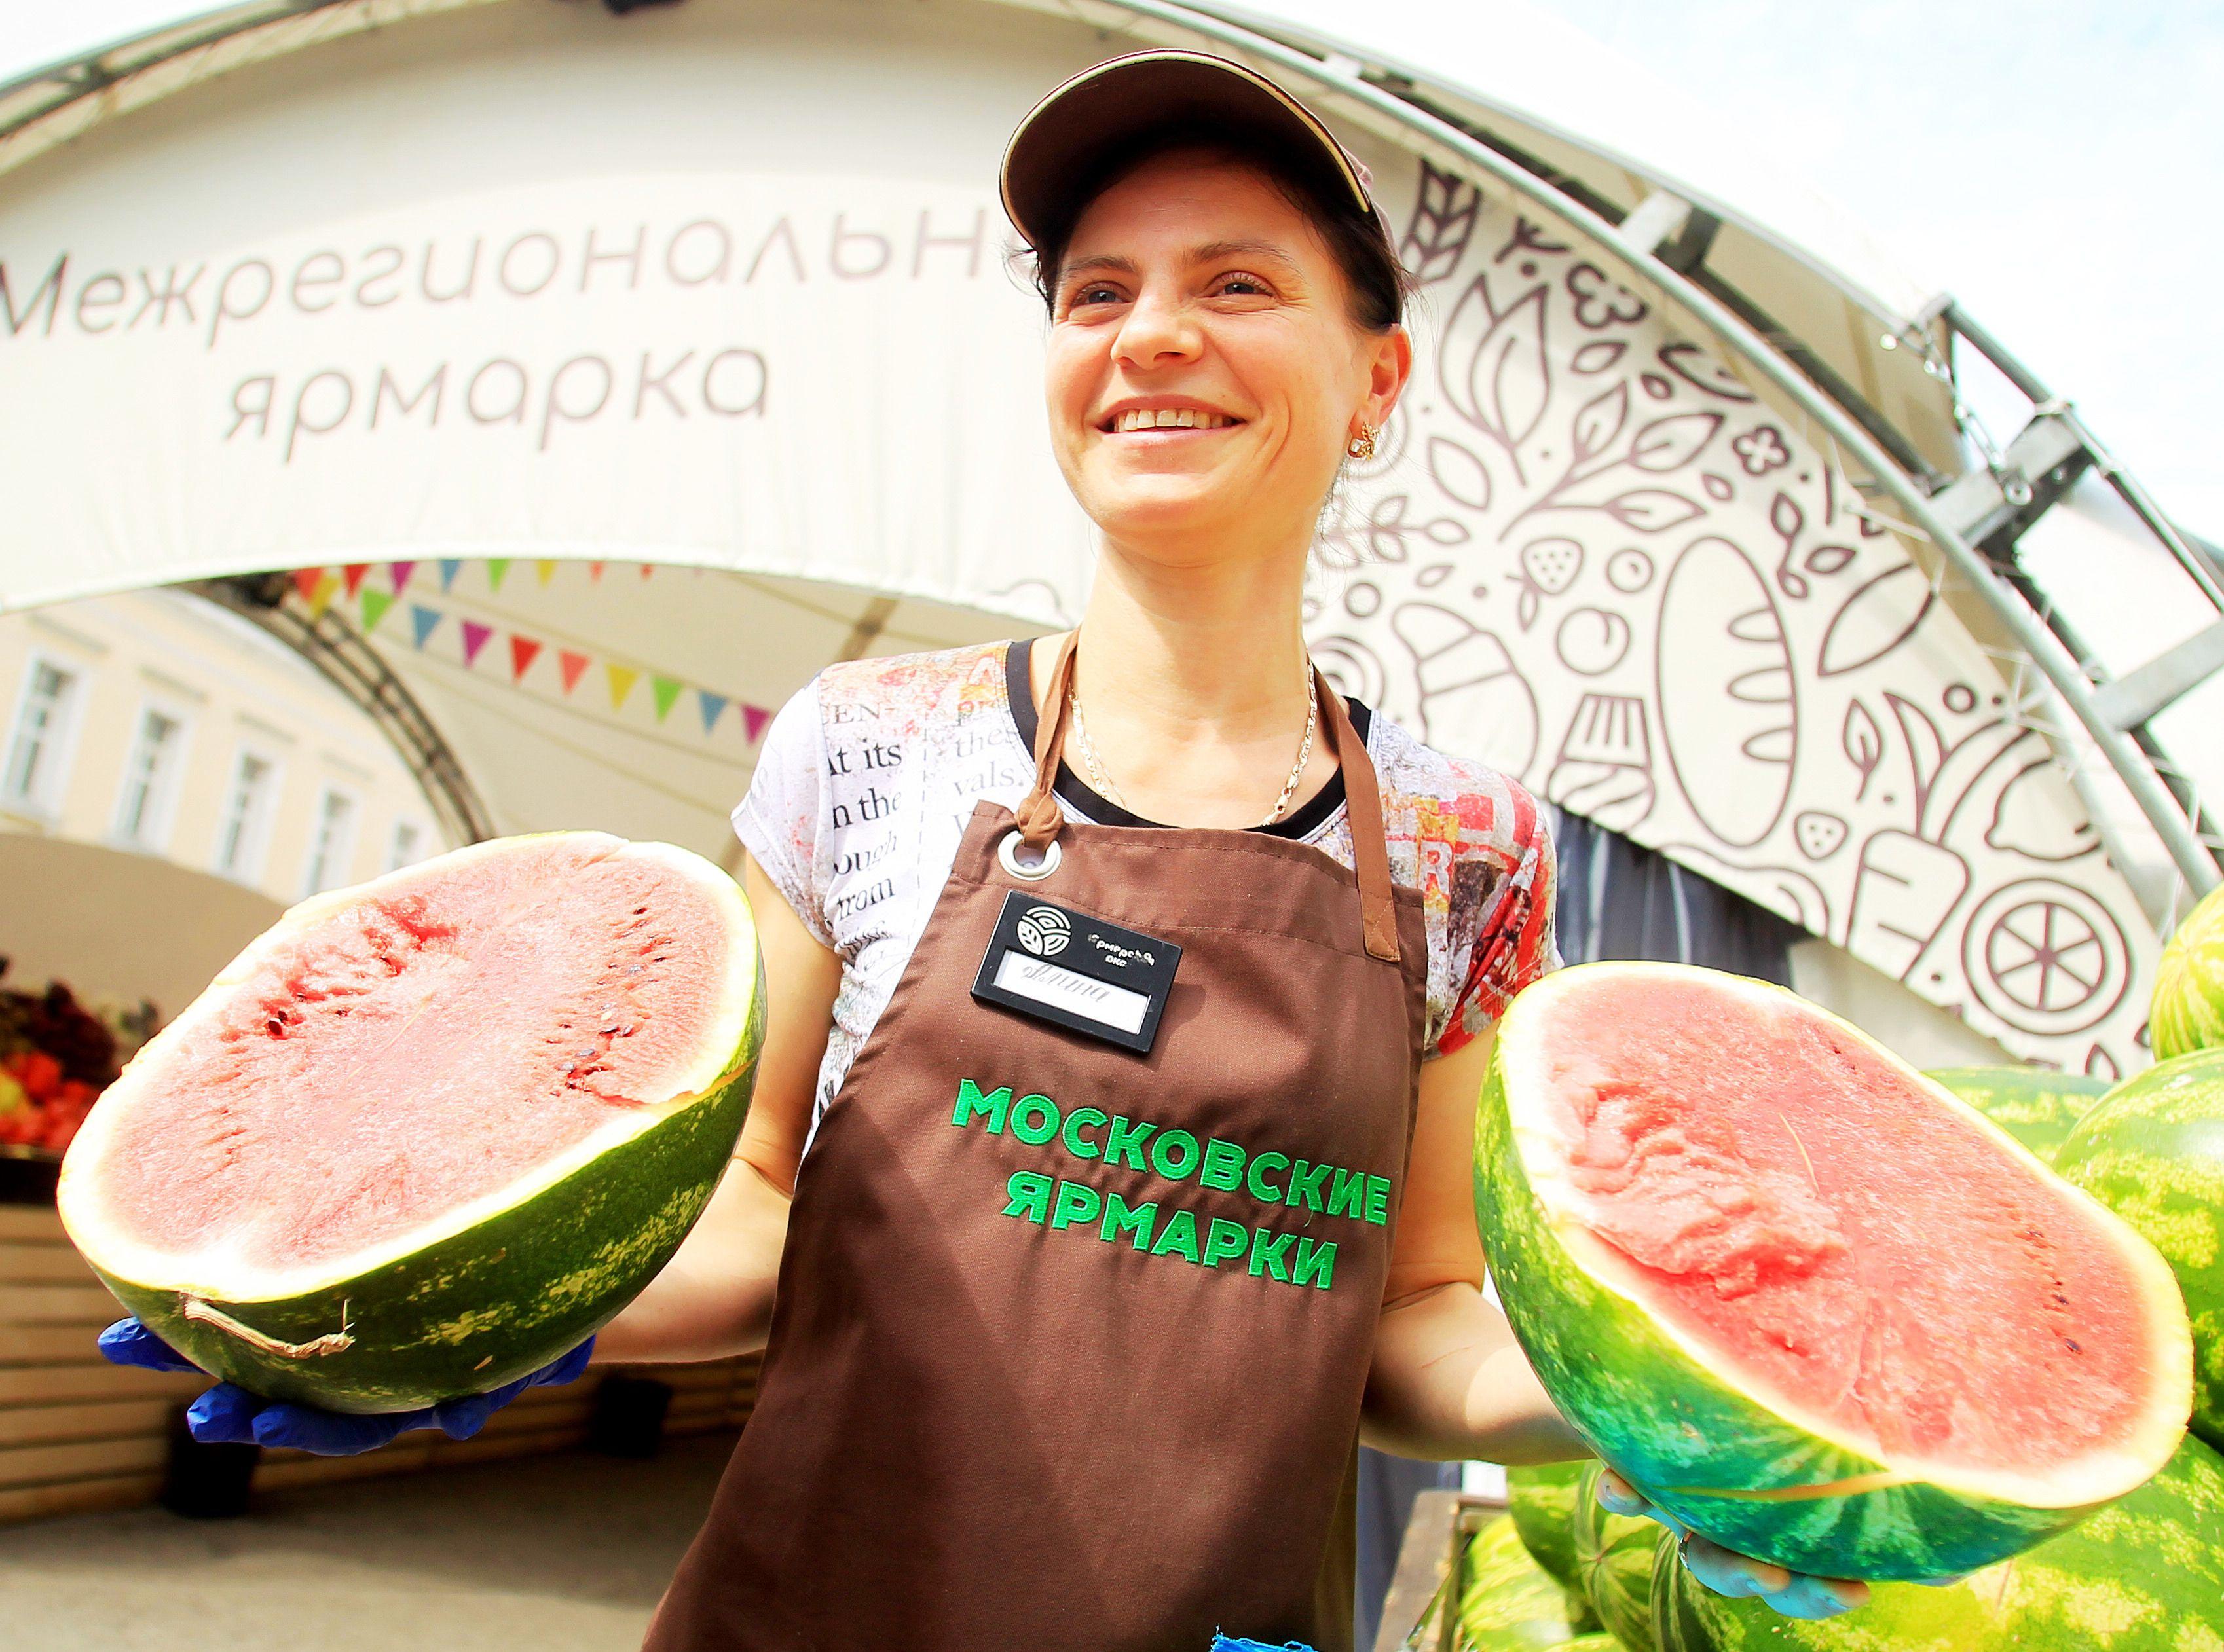 Сезонные ярмарки дарят витамины. Фото: Наталия Нечаева